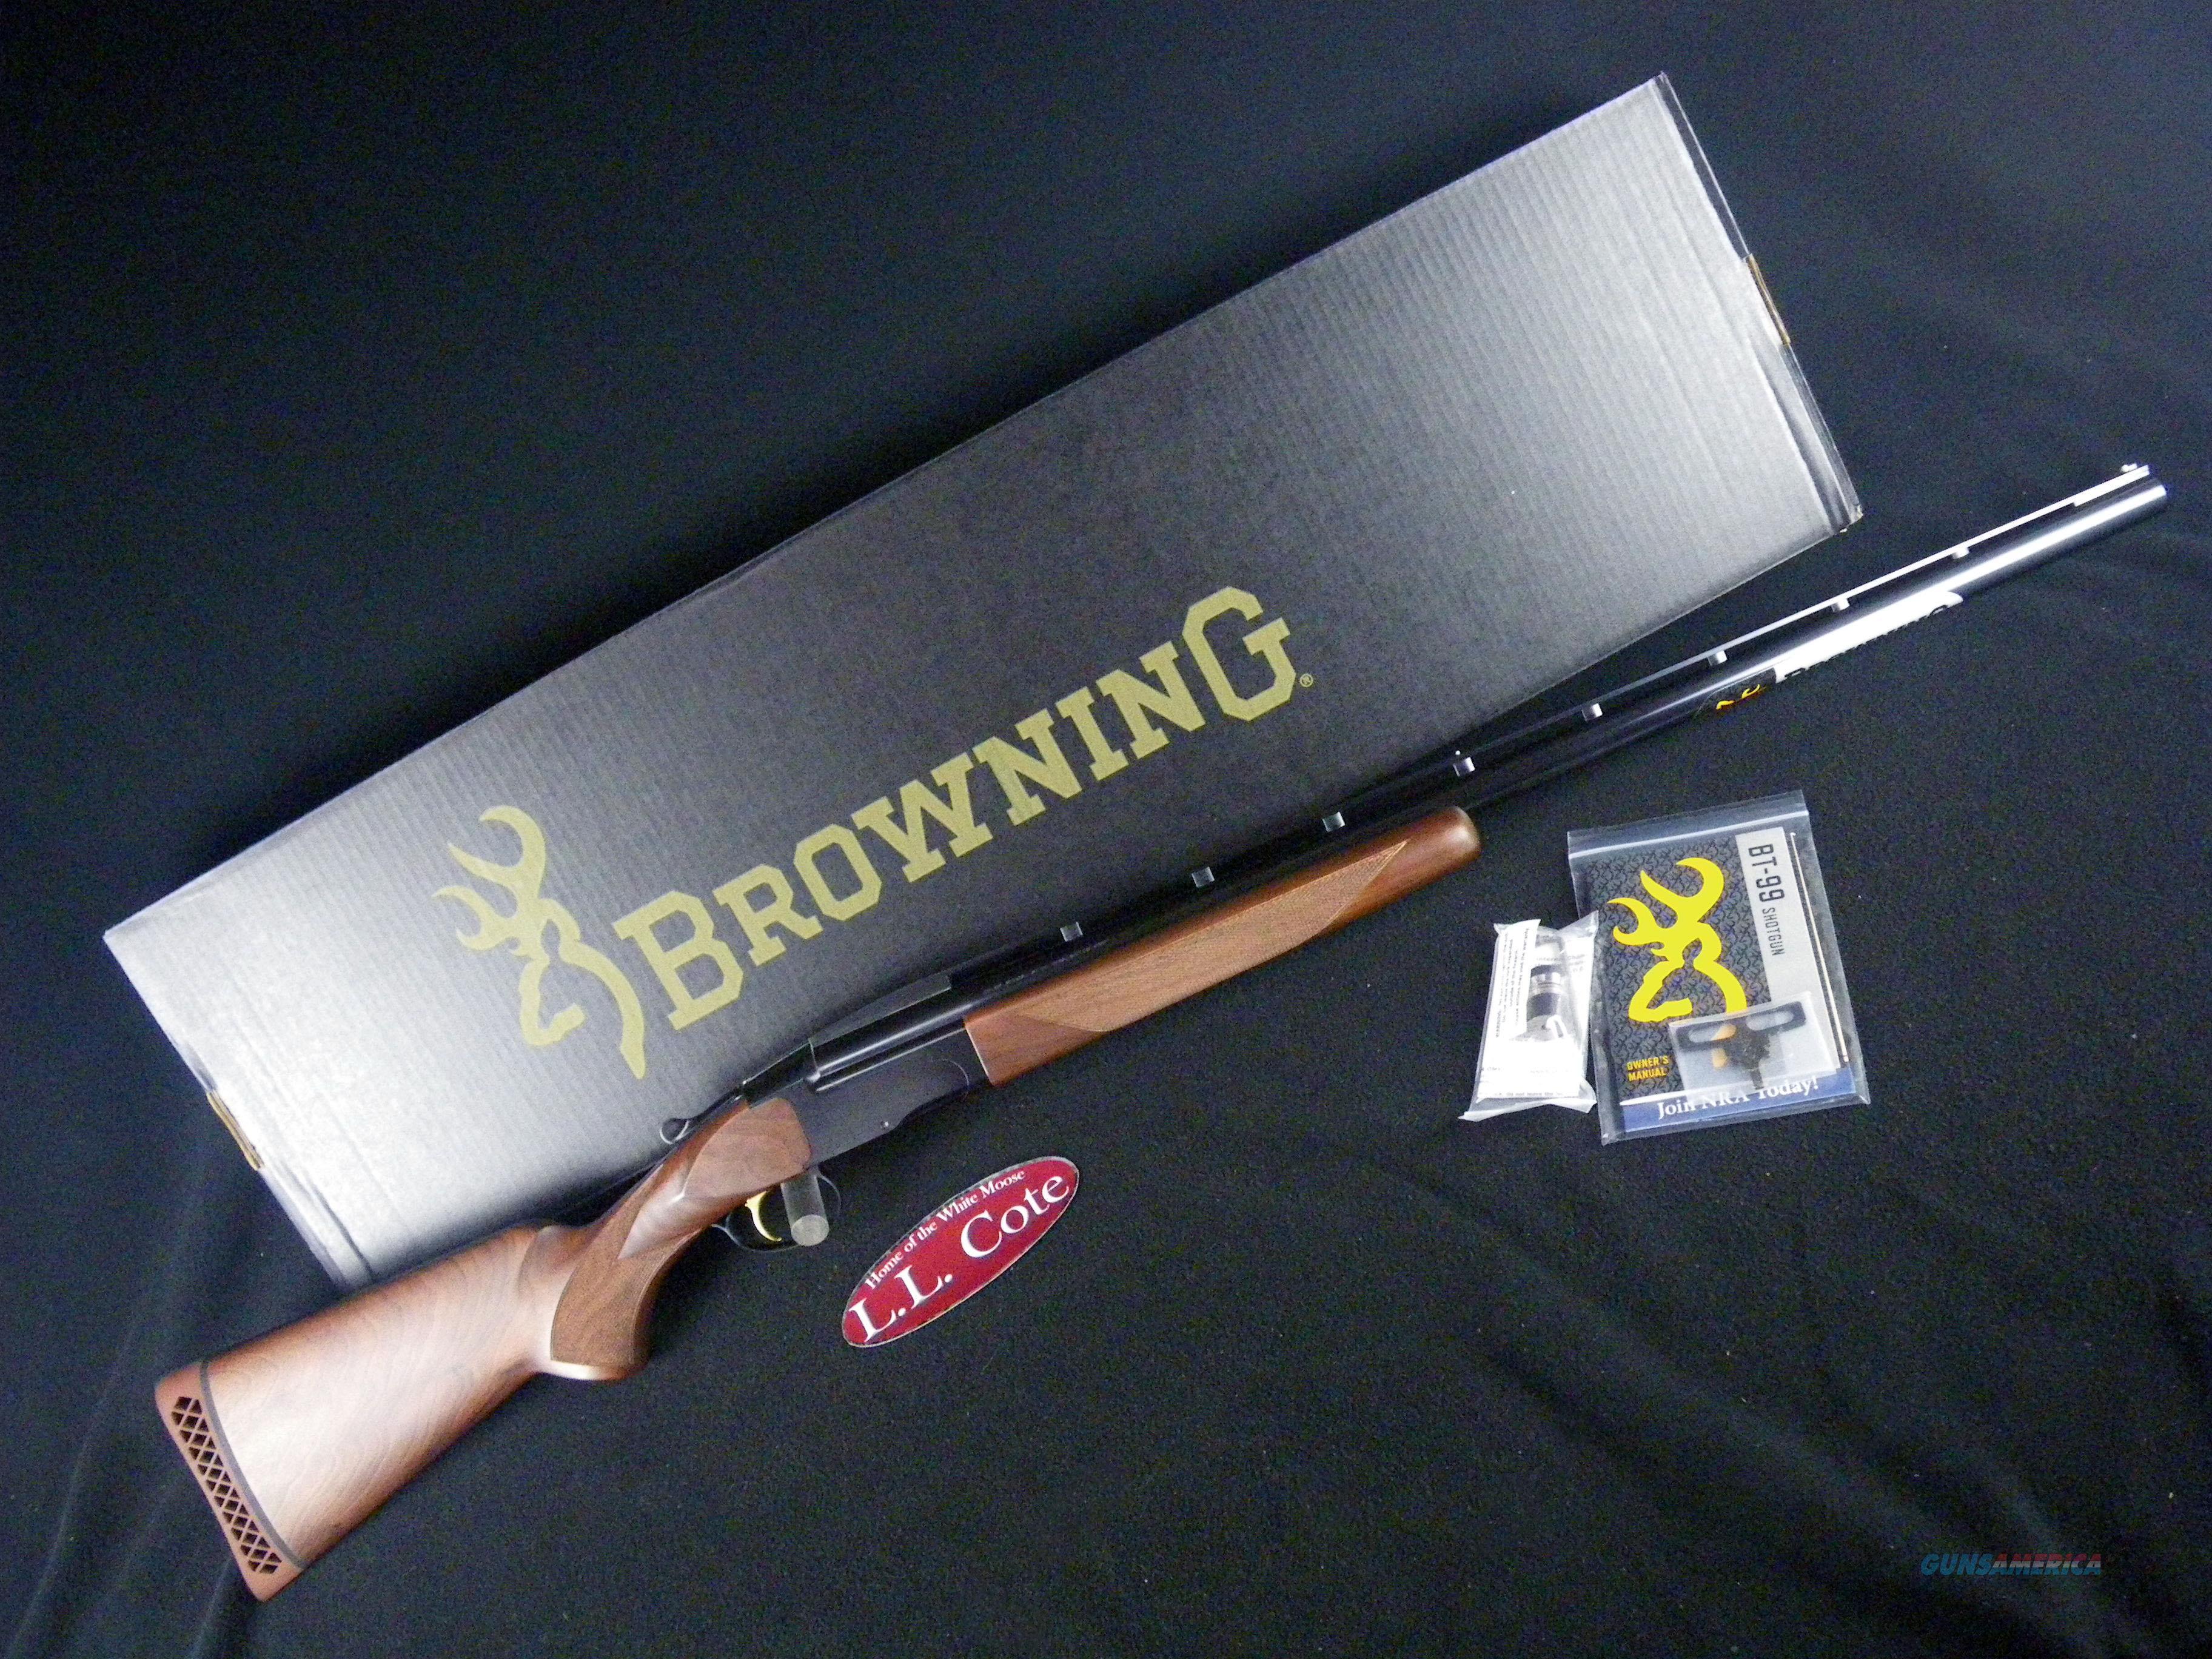 "Browning BT-99 Micro Midas Wood 12ga 30"" NEW 2.75"" 017075403  Guns > Shotguns > Browning Shotguns > Single Barrel"